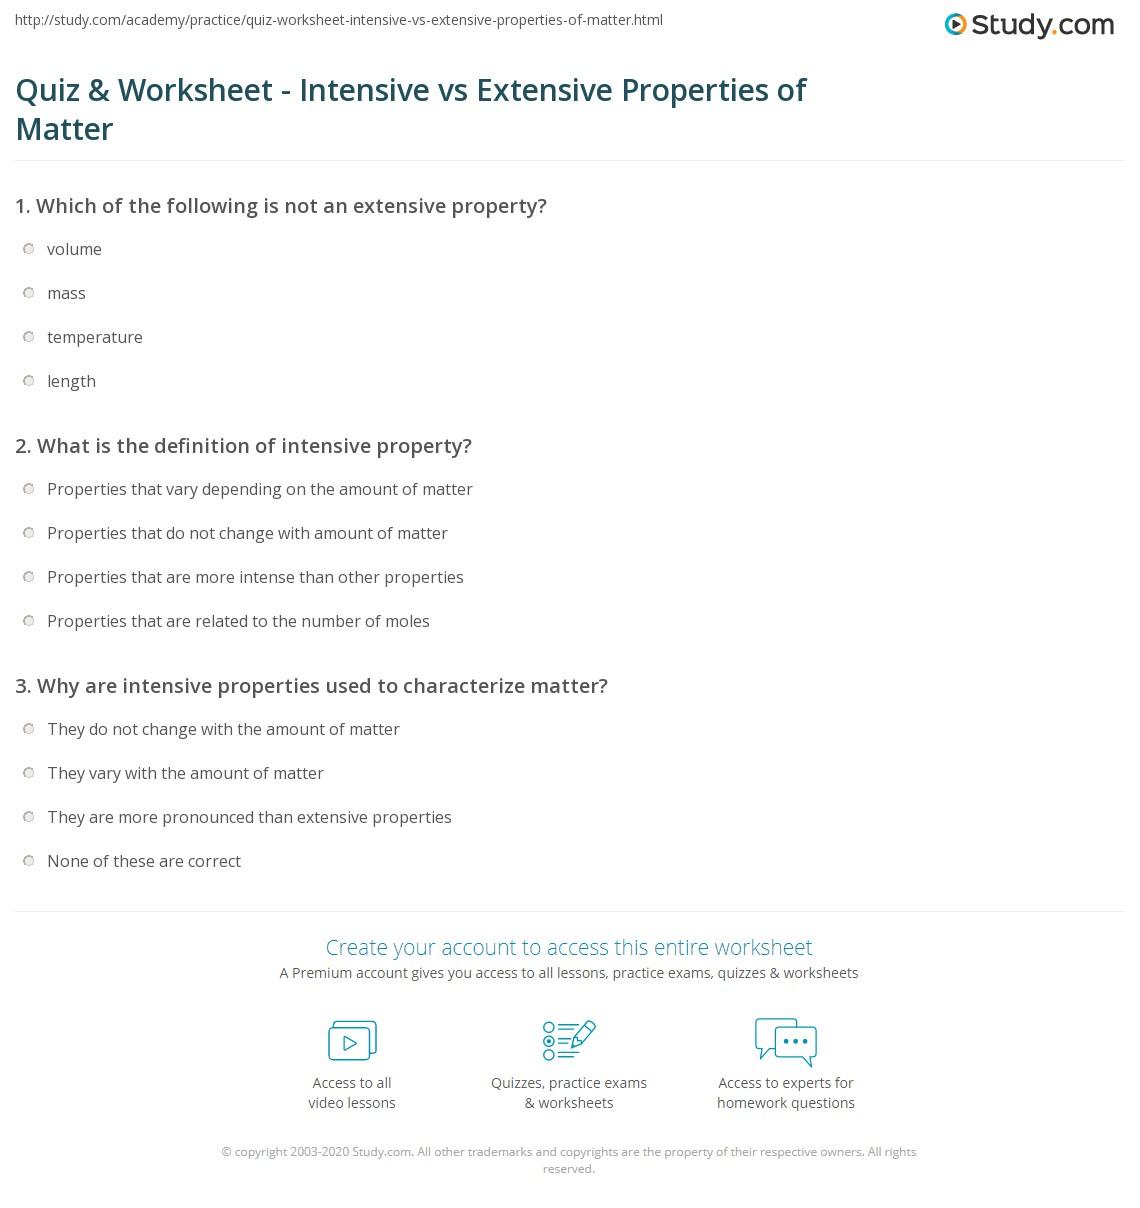 Quiz & Worksheet - Intensive vs Extensive Properties of Matter  worksheets, free worksheets, printable worksheets, and worksheets for teachers Physical Properties Of Matter Worksheets 1182 x 1140